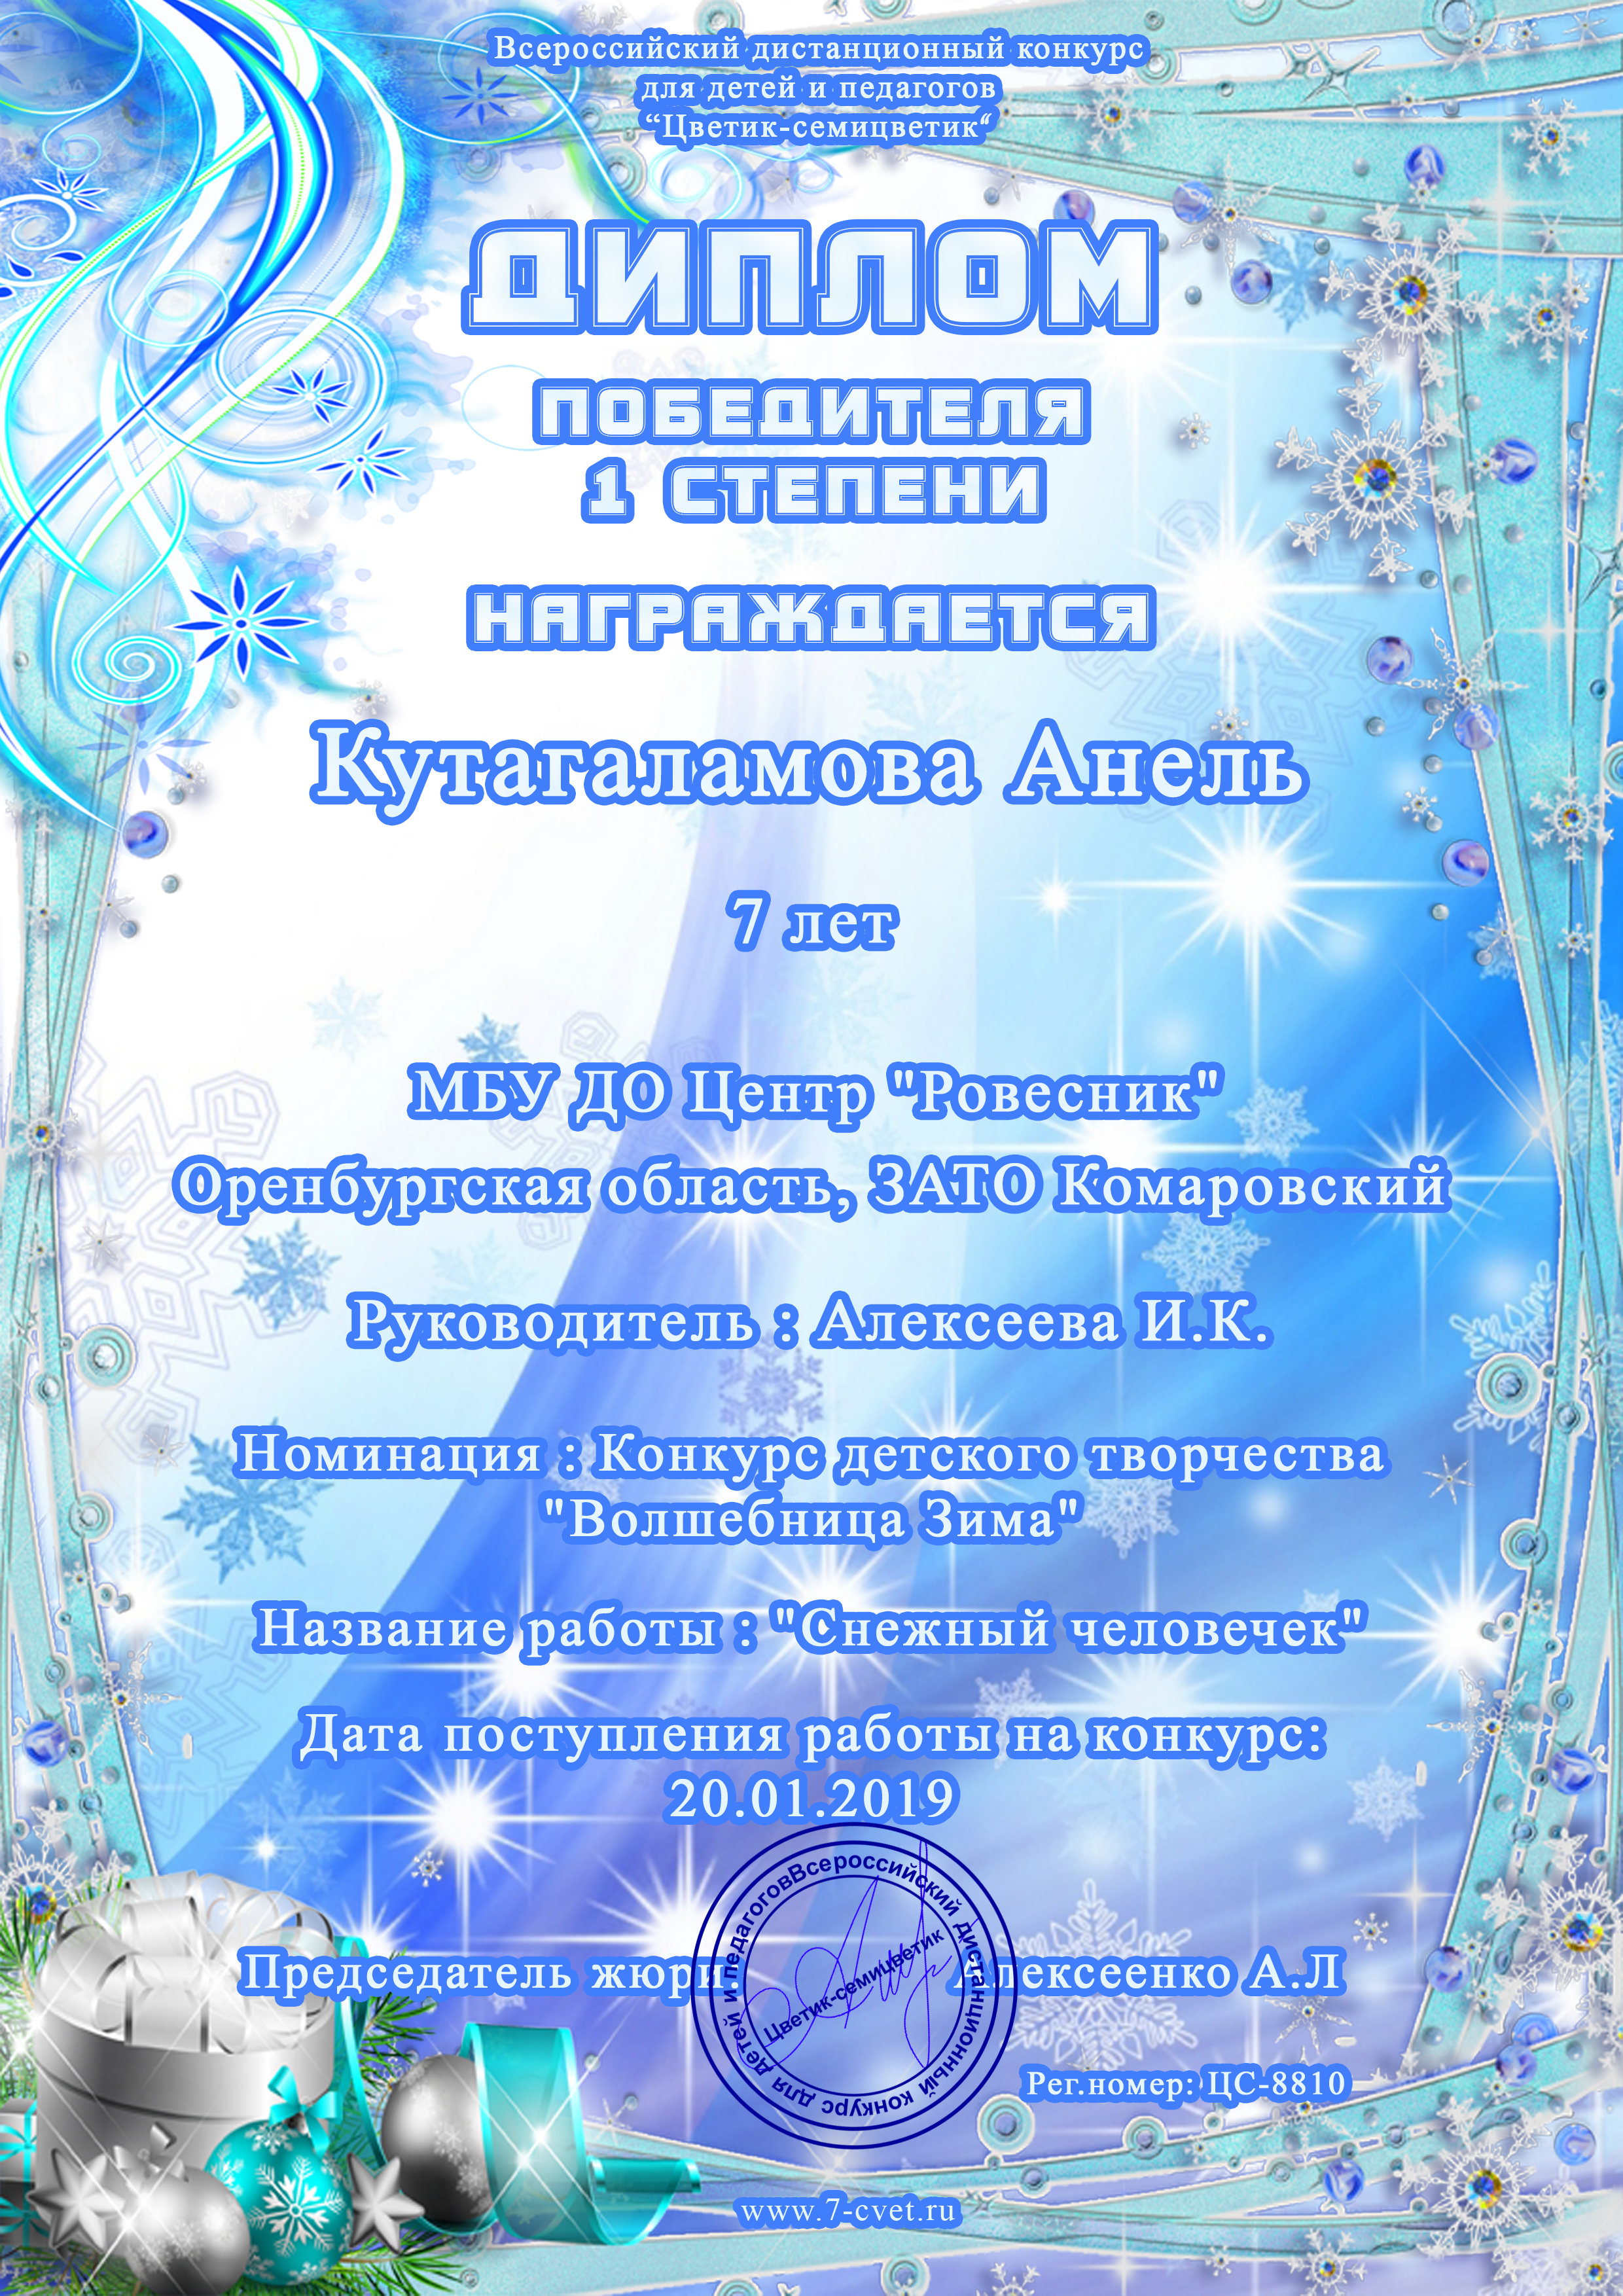 Кутагаламова Анель